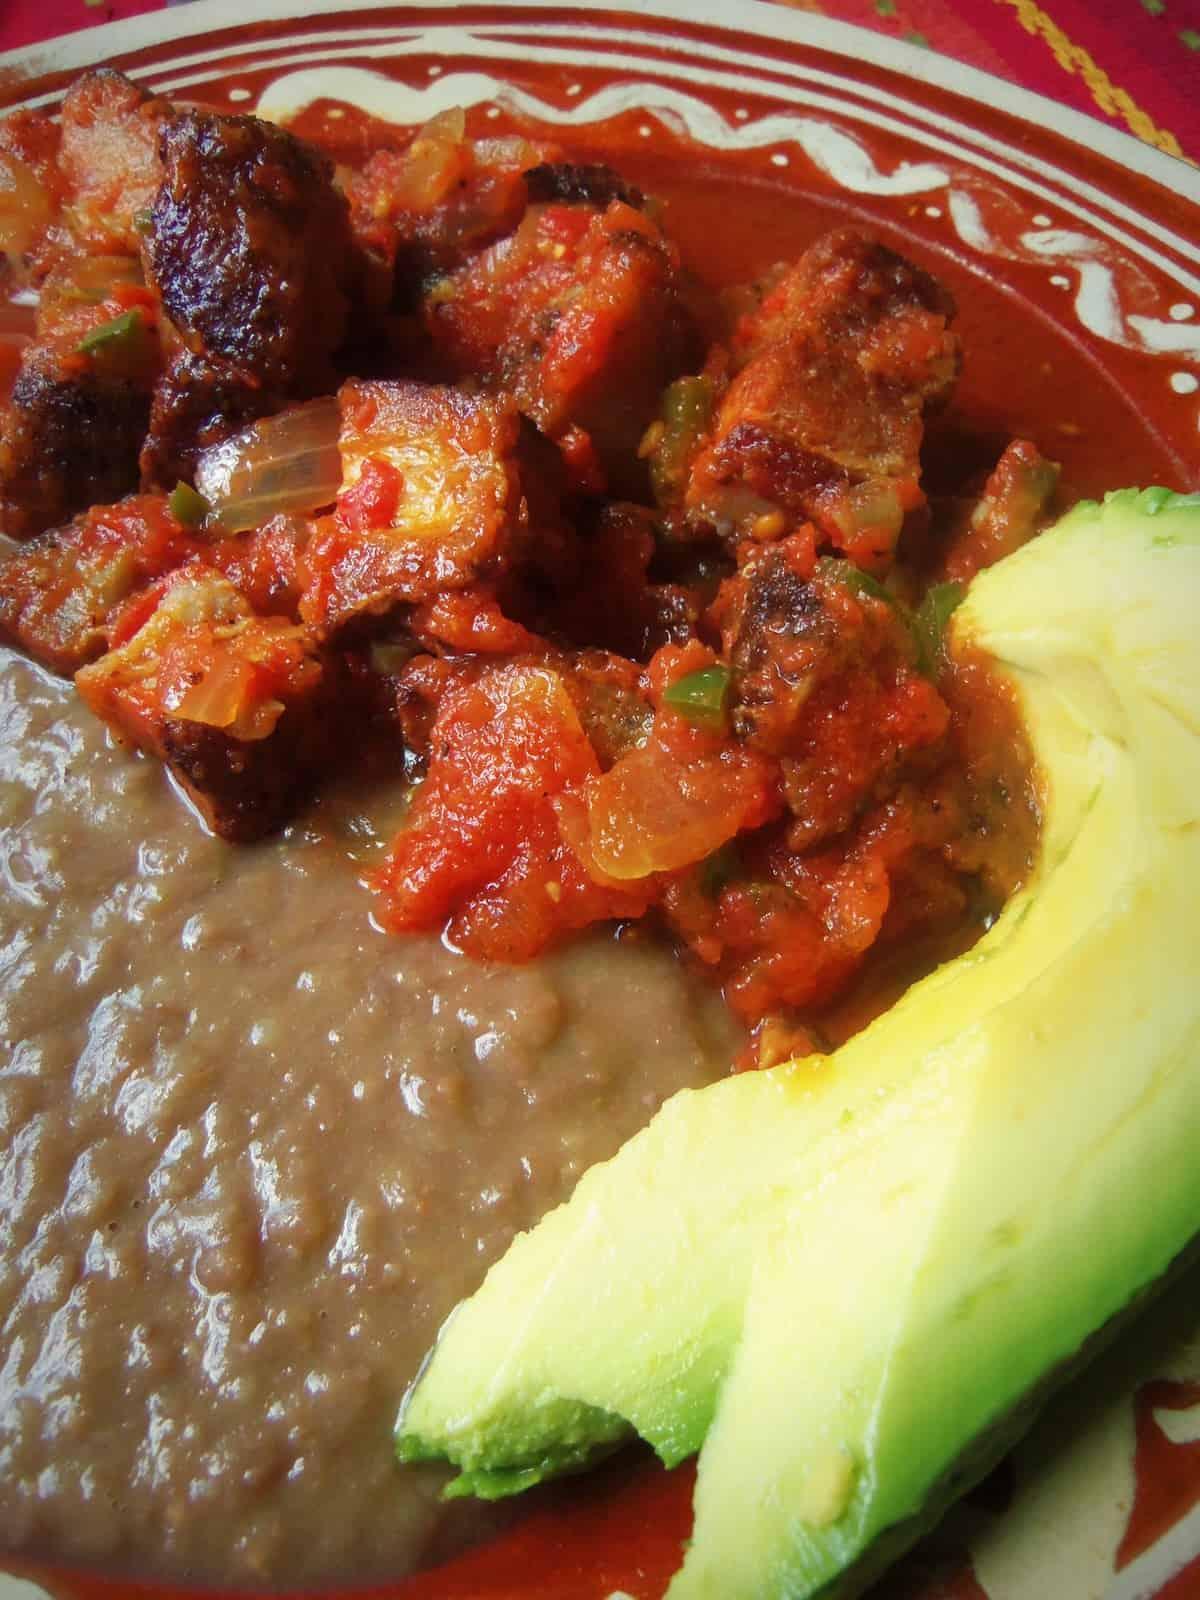 Carniceria Style Chicharron en Salsa Roja